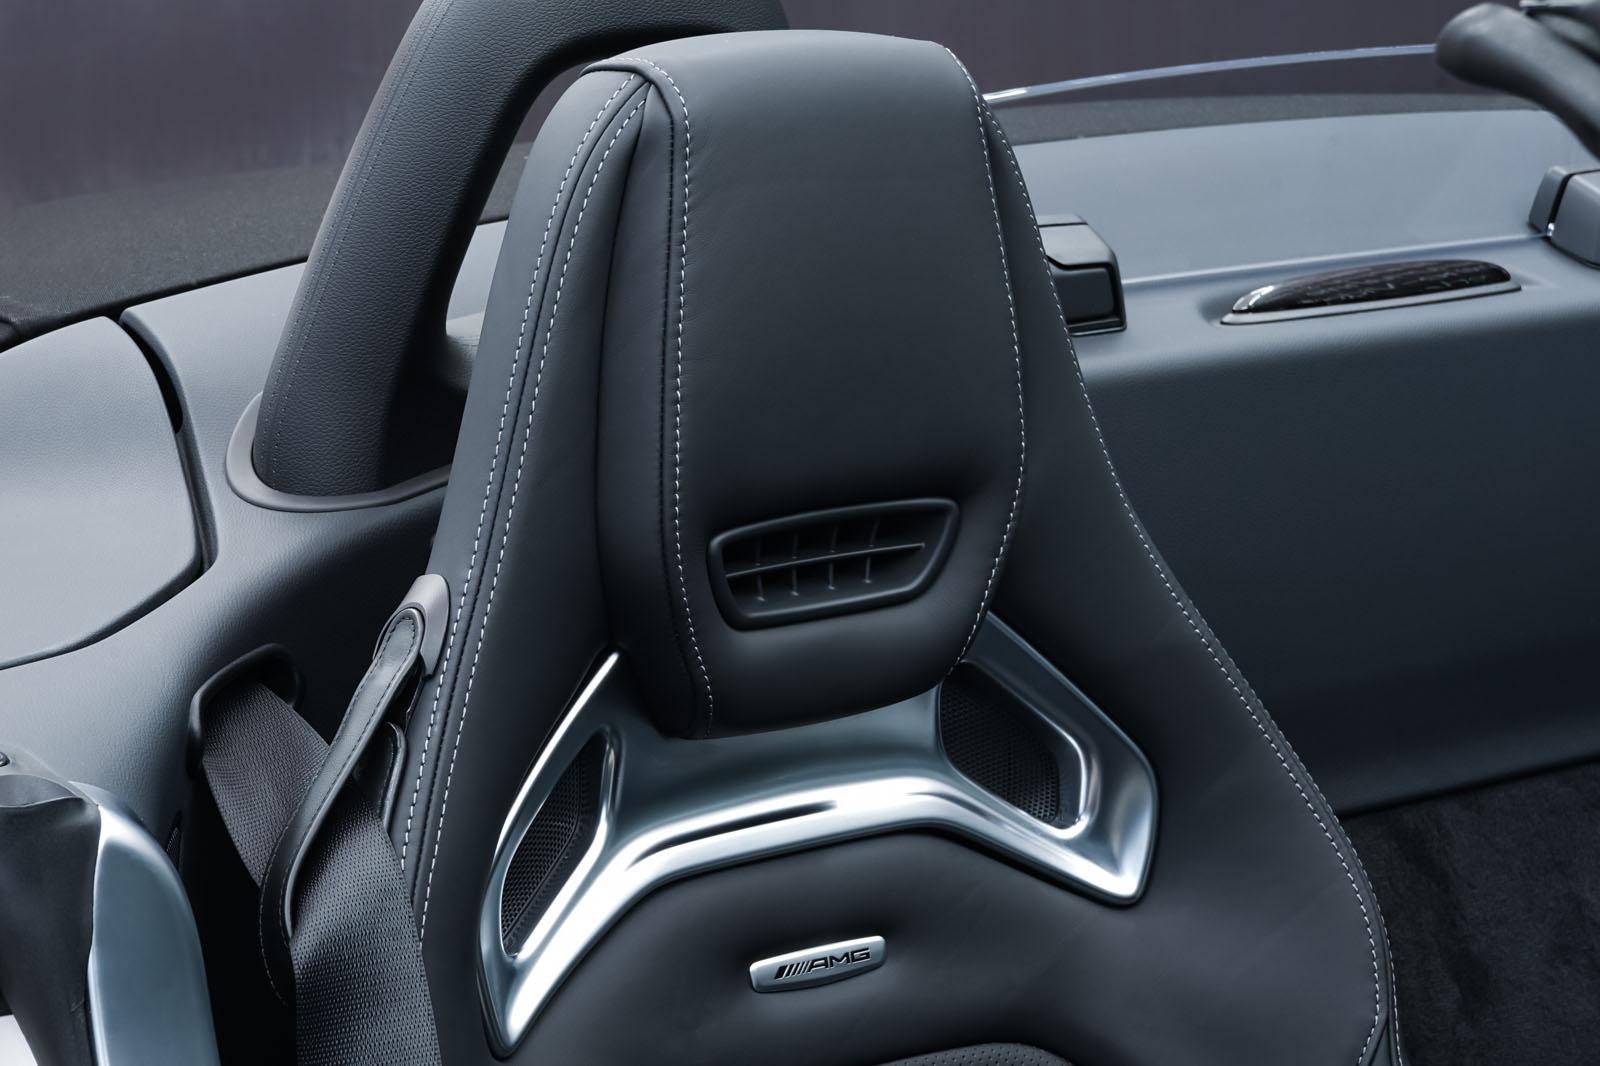 11Mercedes_Benz_AMG_GT_Roadster_Weiss_Schwarz_MB-9710_18_w